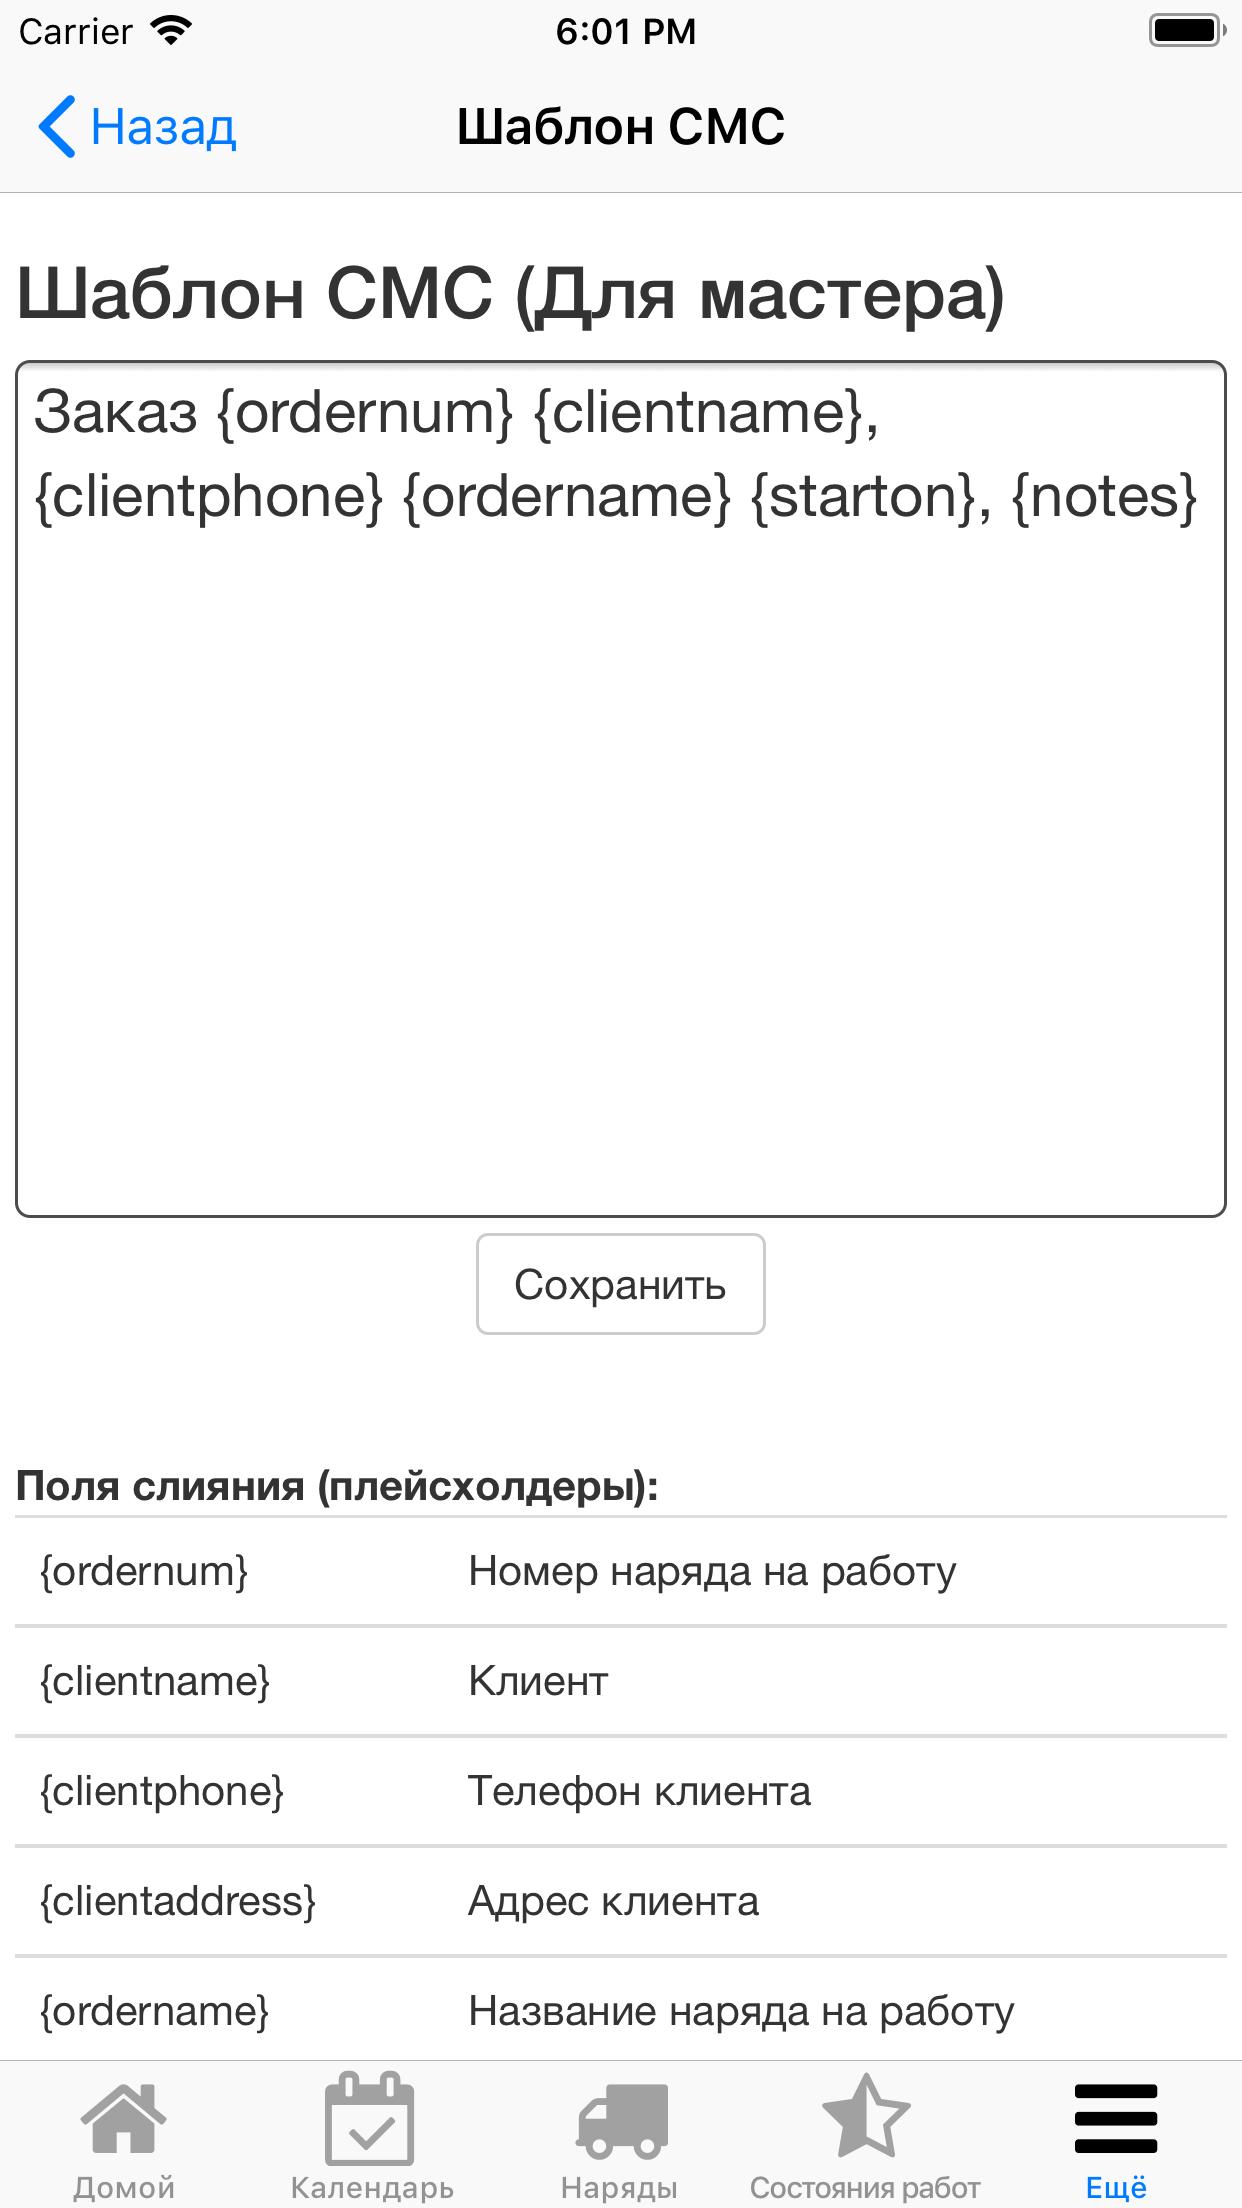 Нано управление сервисом. Шаблон SMS